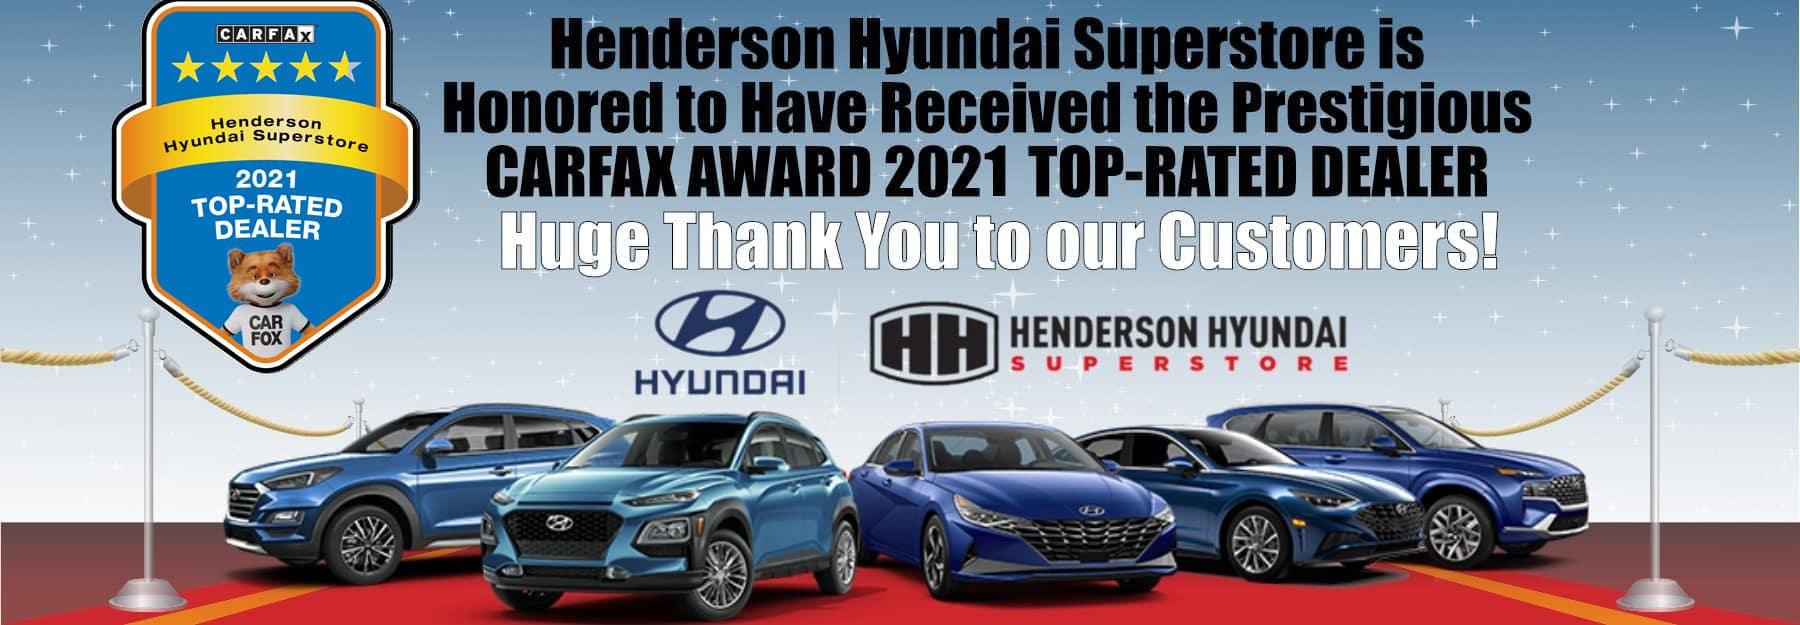 March_2021 CarFaxAward_2021_Henderson Hyundai